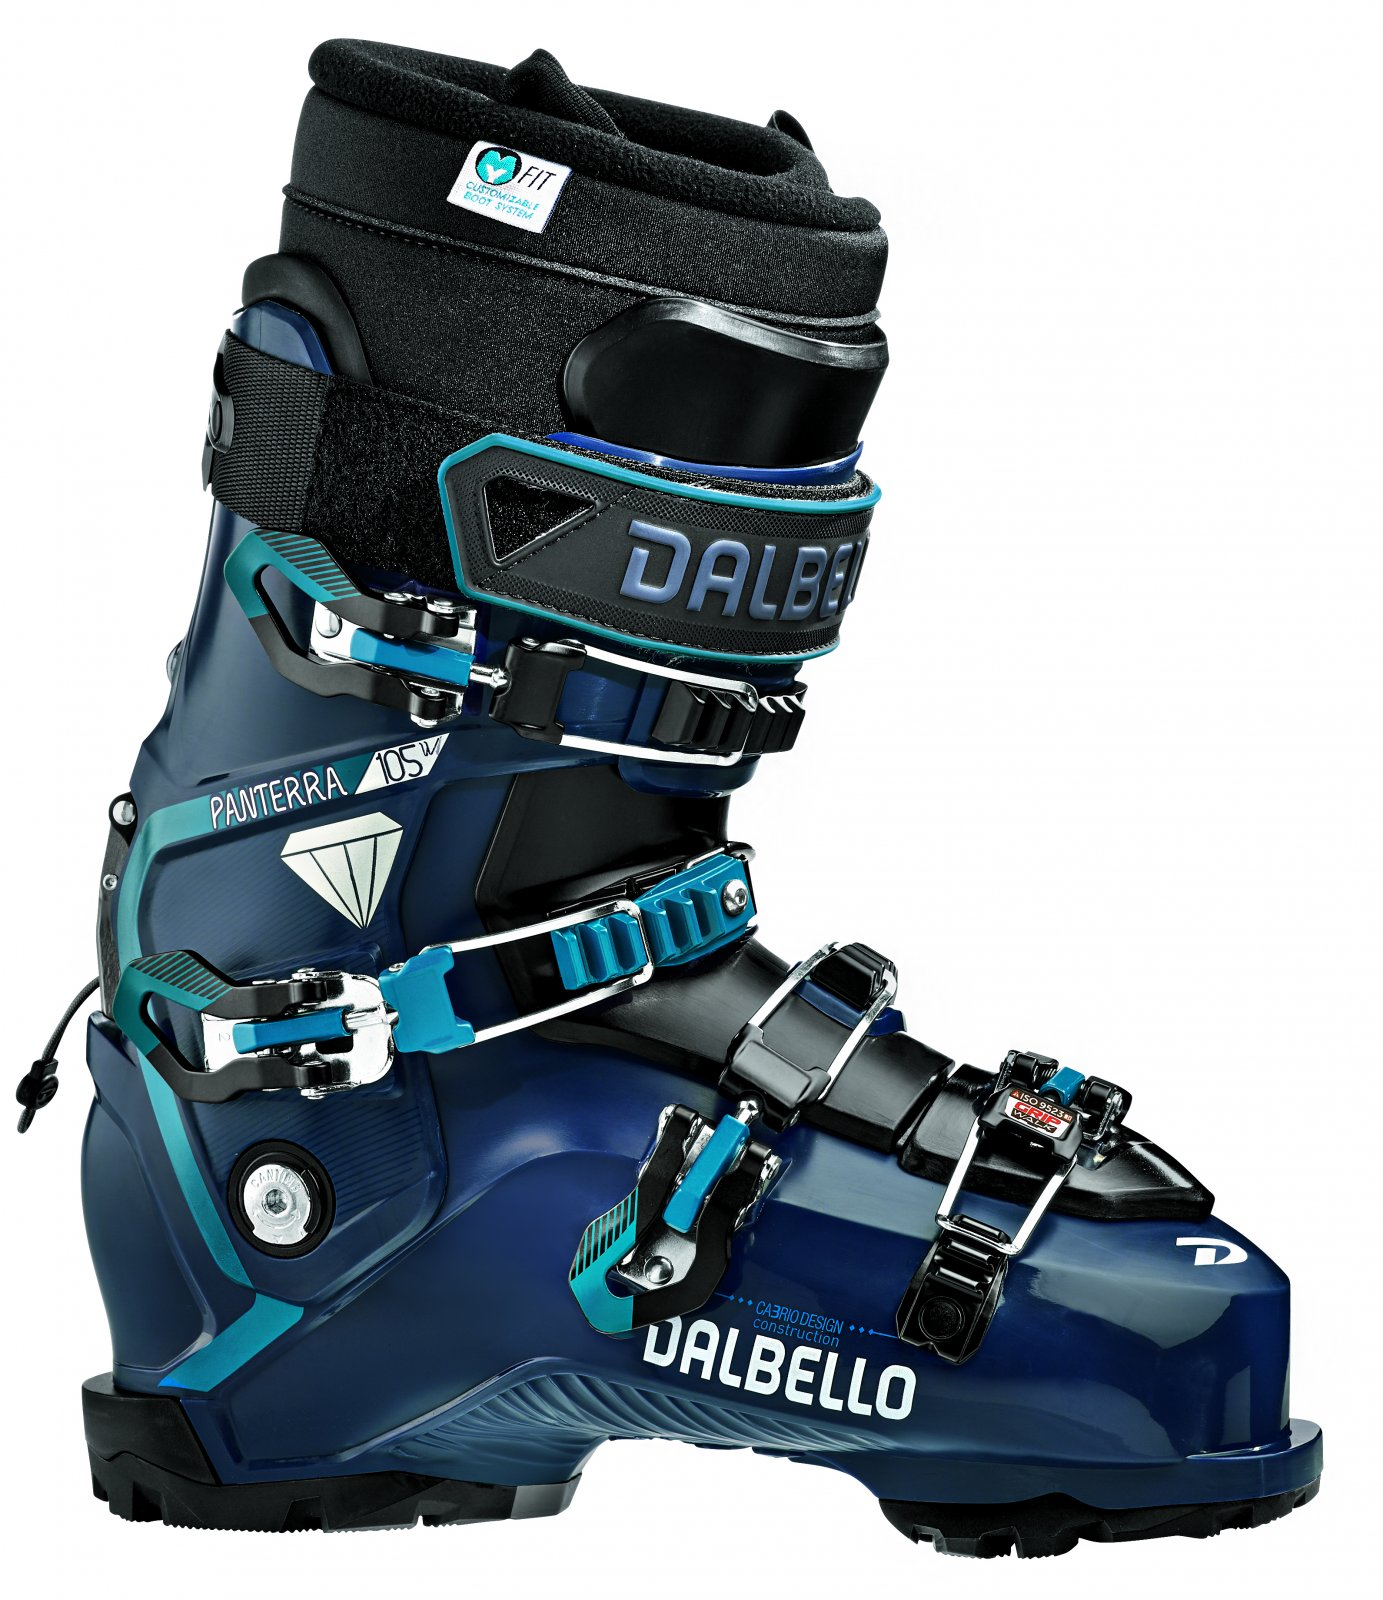 Dalbello Panterra 105 W ID GW Ski Boots 2020 - size 24.5